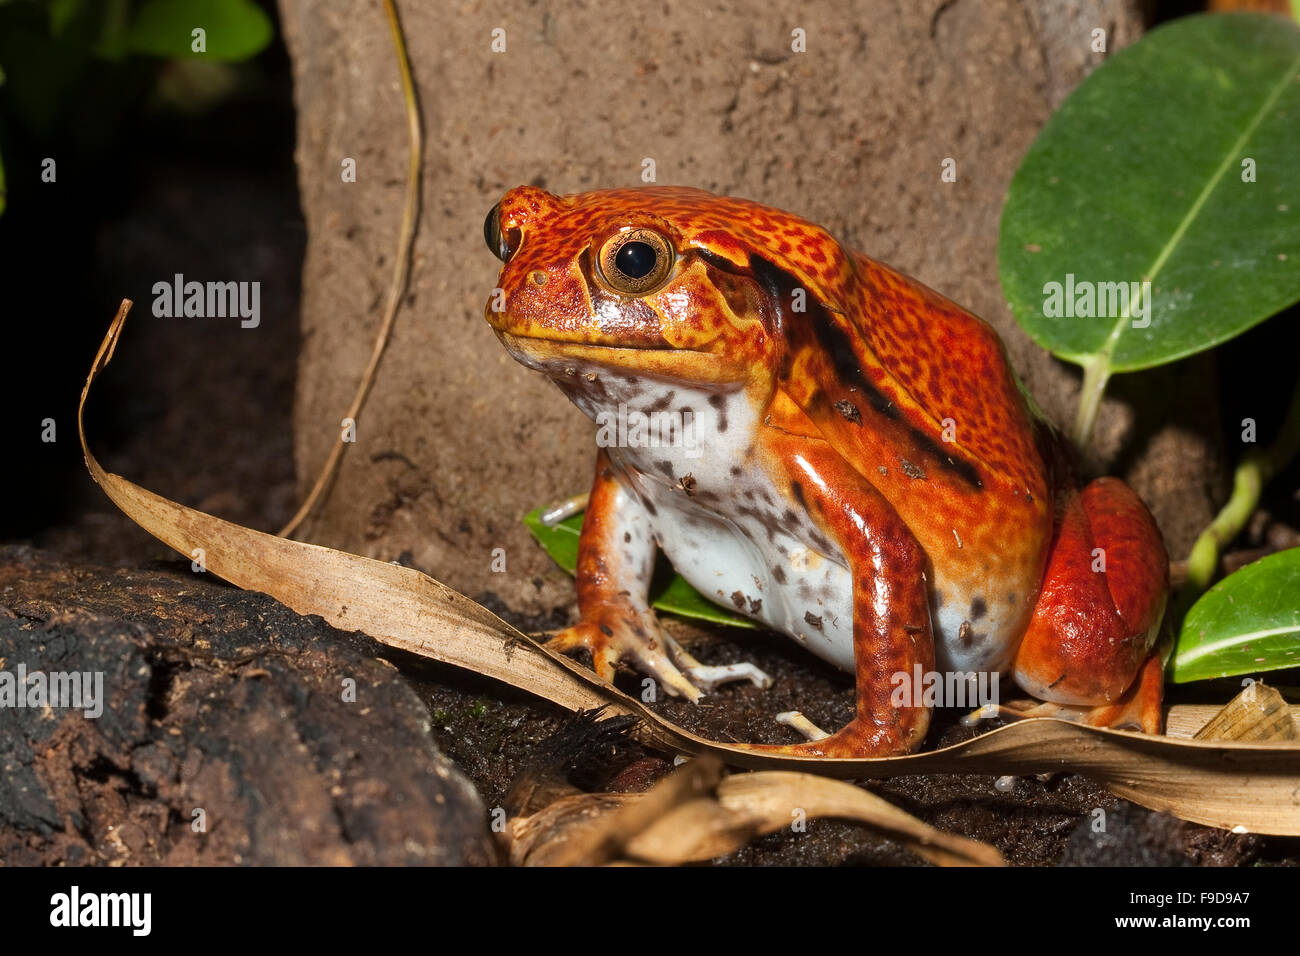 Southern Tomato Frog, False Tomato Frog, Südlicher Tomatenfrosch, Gefleckter Tomaten-Frosch, Frosch, Dyscophus - Stock Image